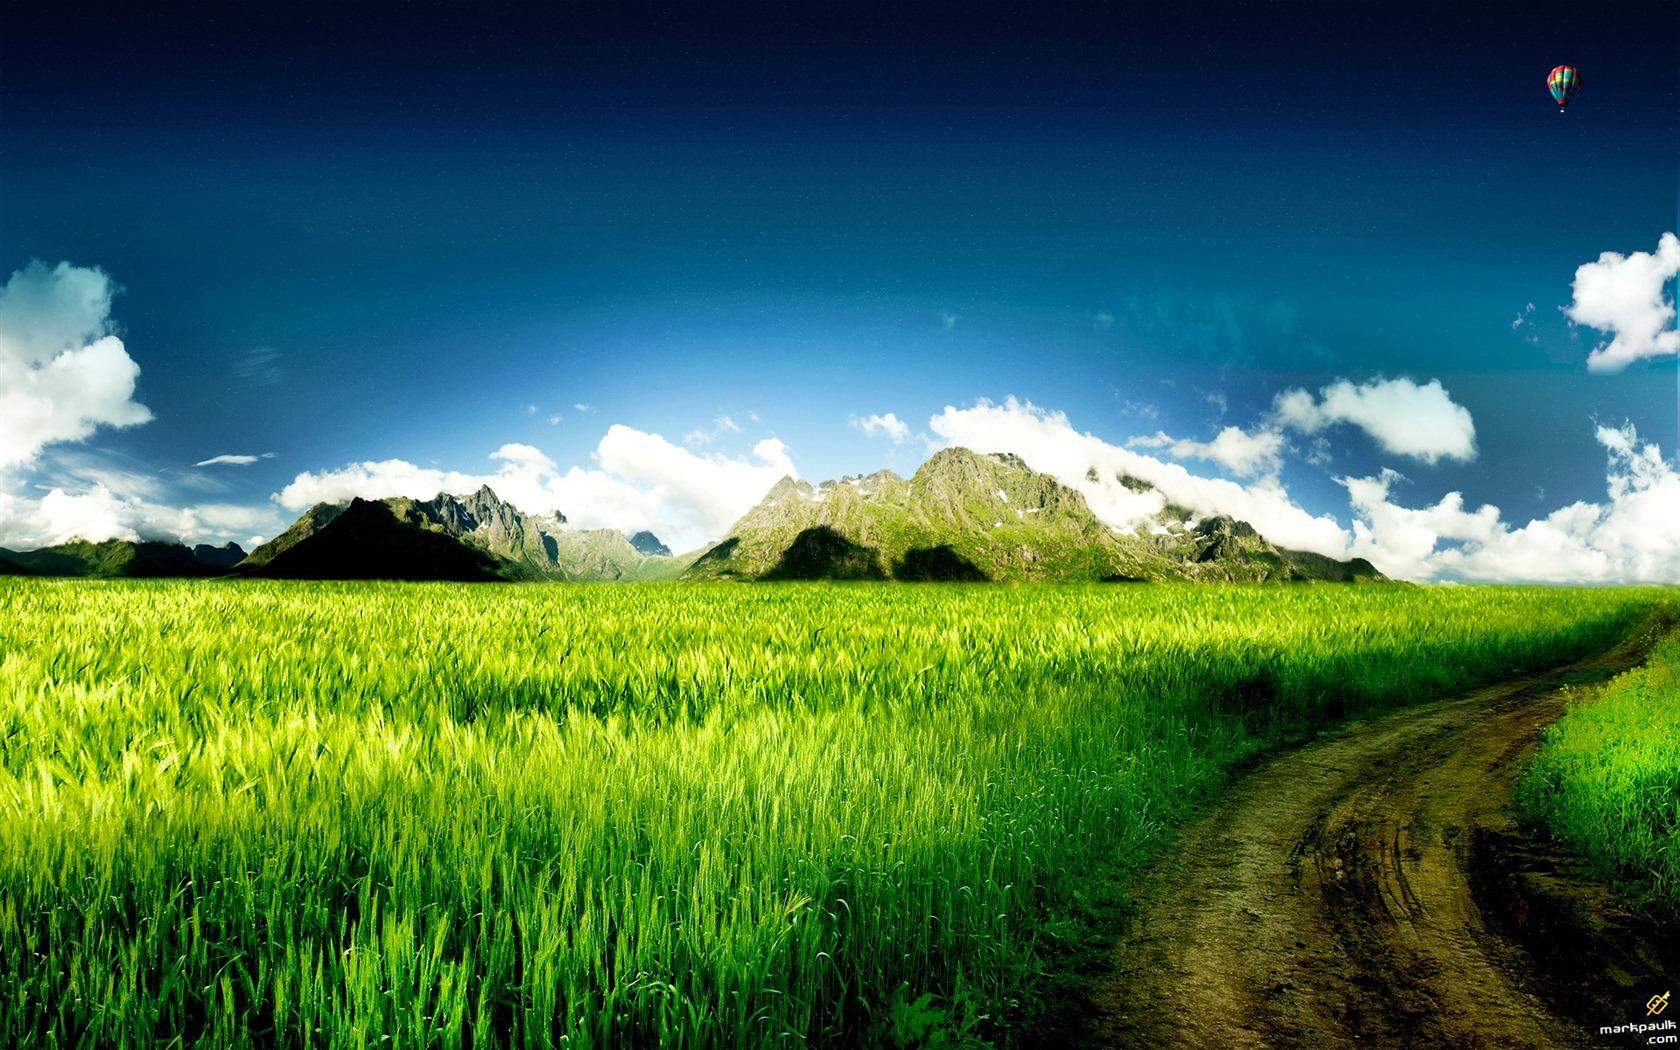 HD Widescreen Wallpapers Landscape #17